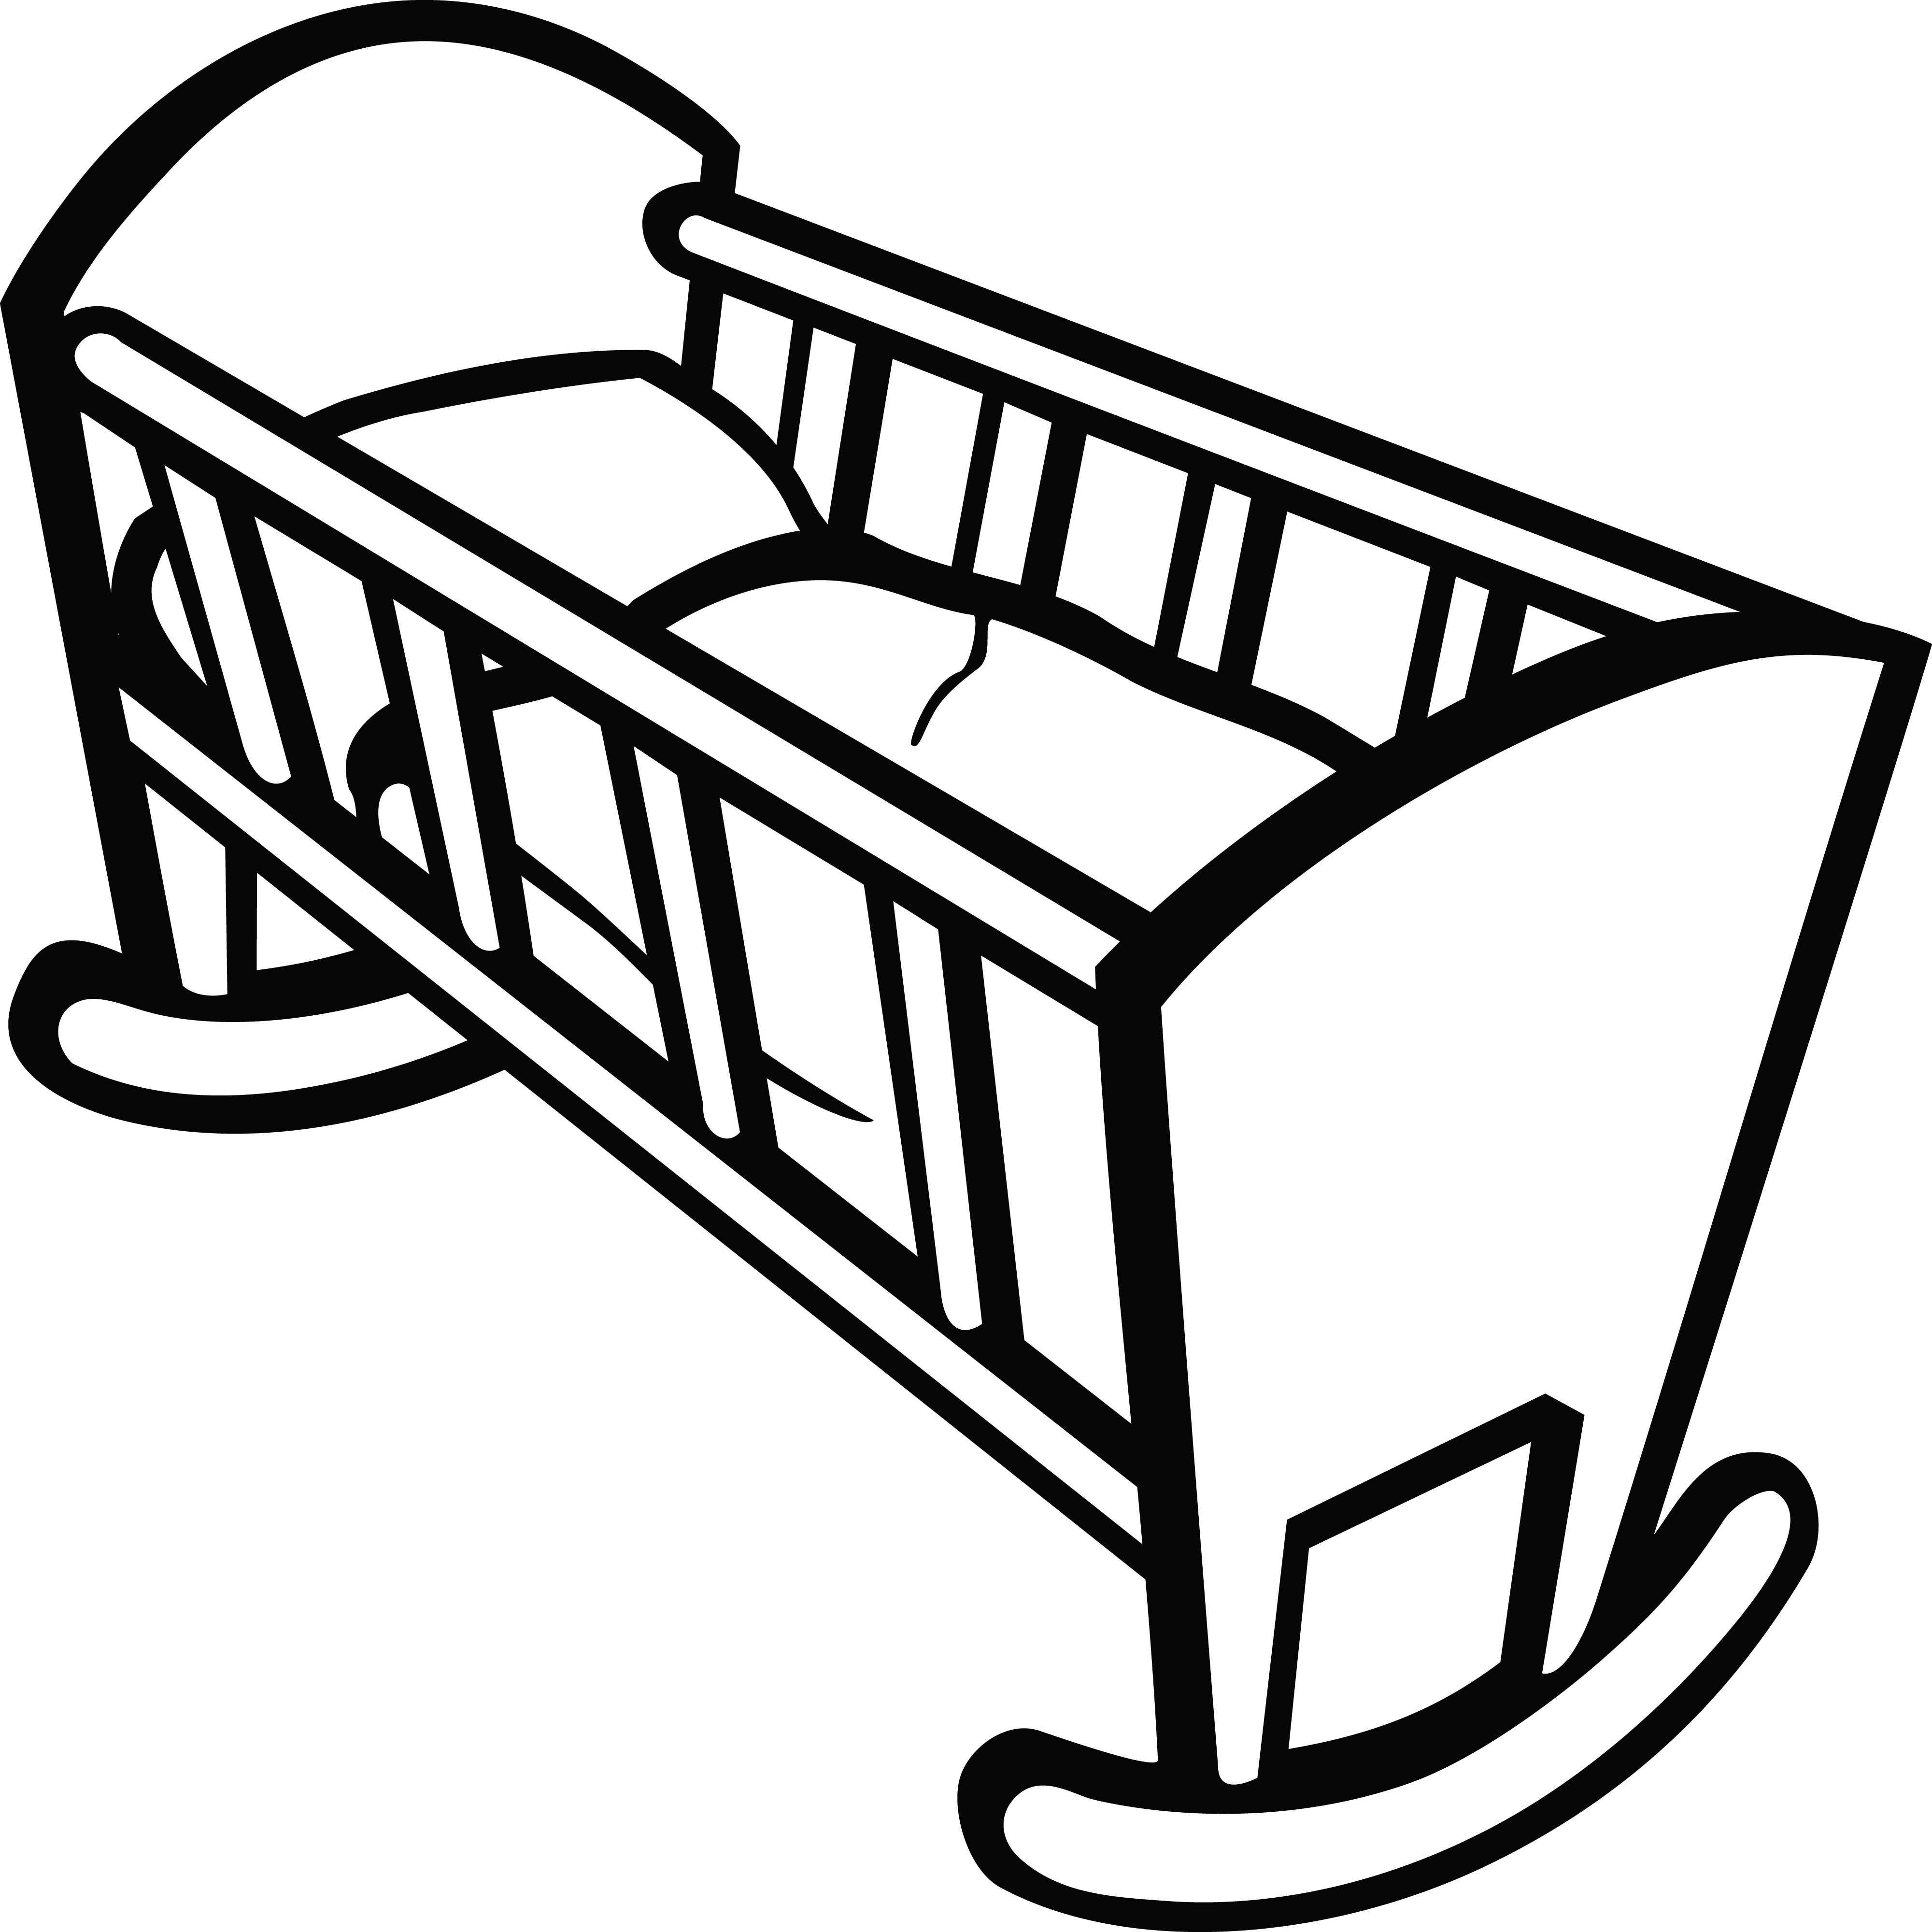 clipart of a baby crib crib pinterest crib filing and free rh pinterest com baby girl crib clipart